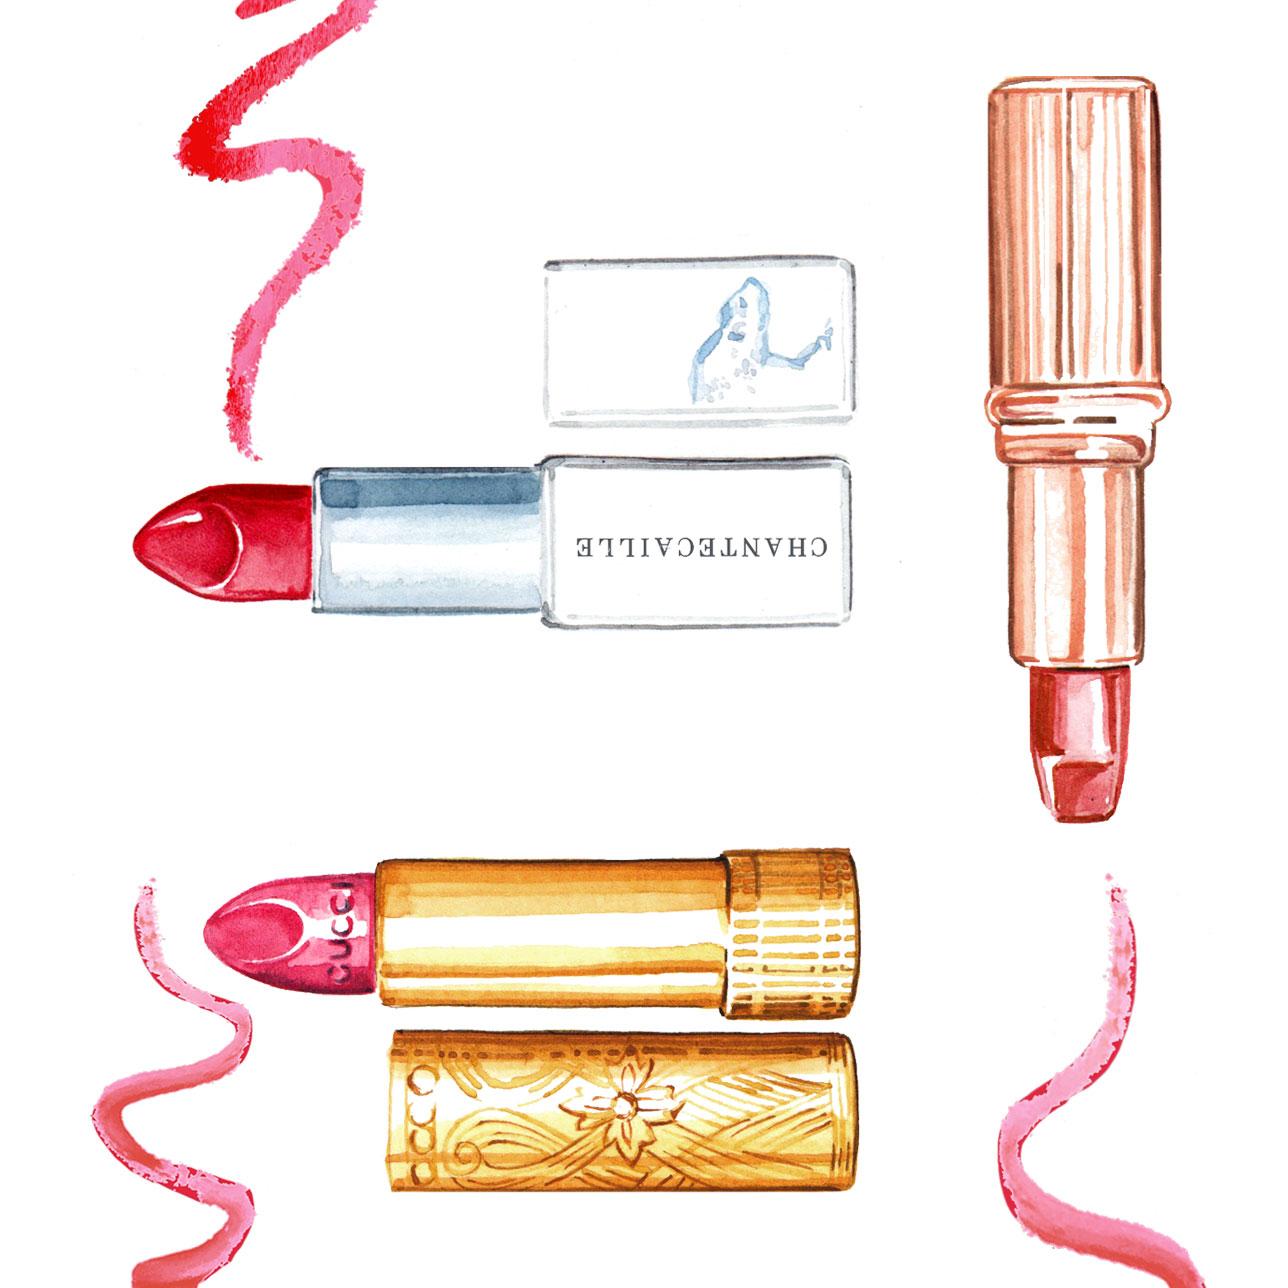 Willa Gebbie watercolour beauty illustrations for Porter digital